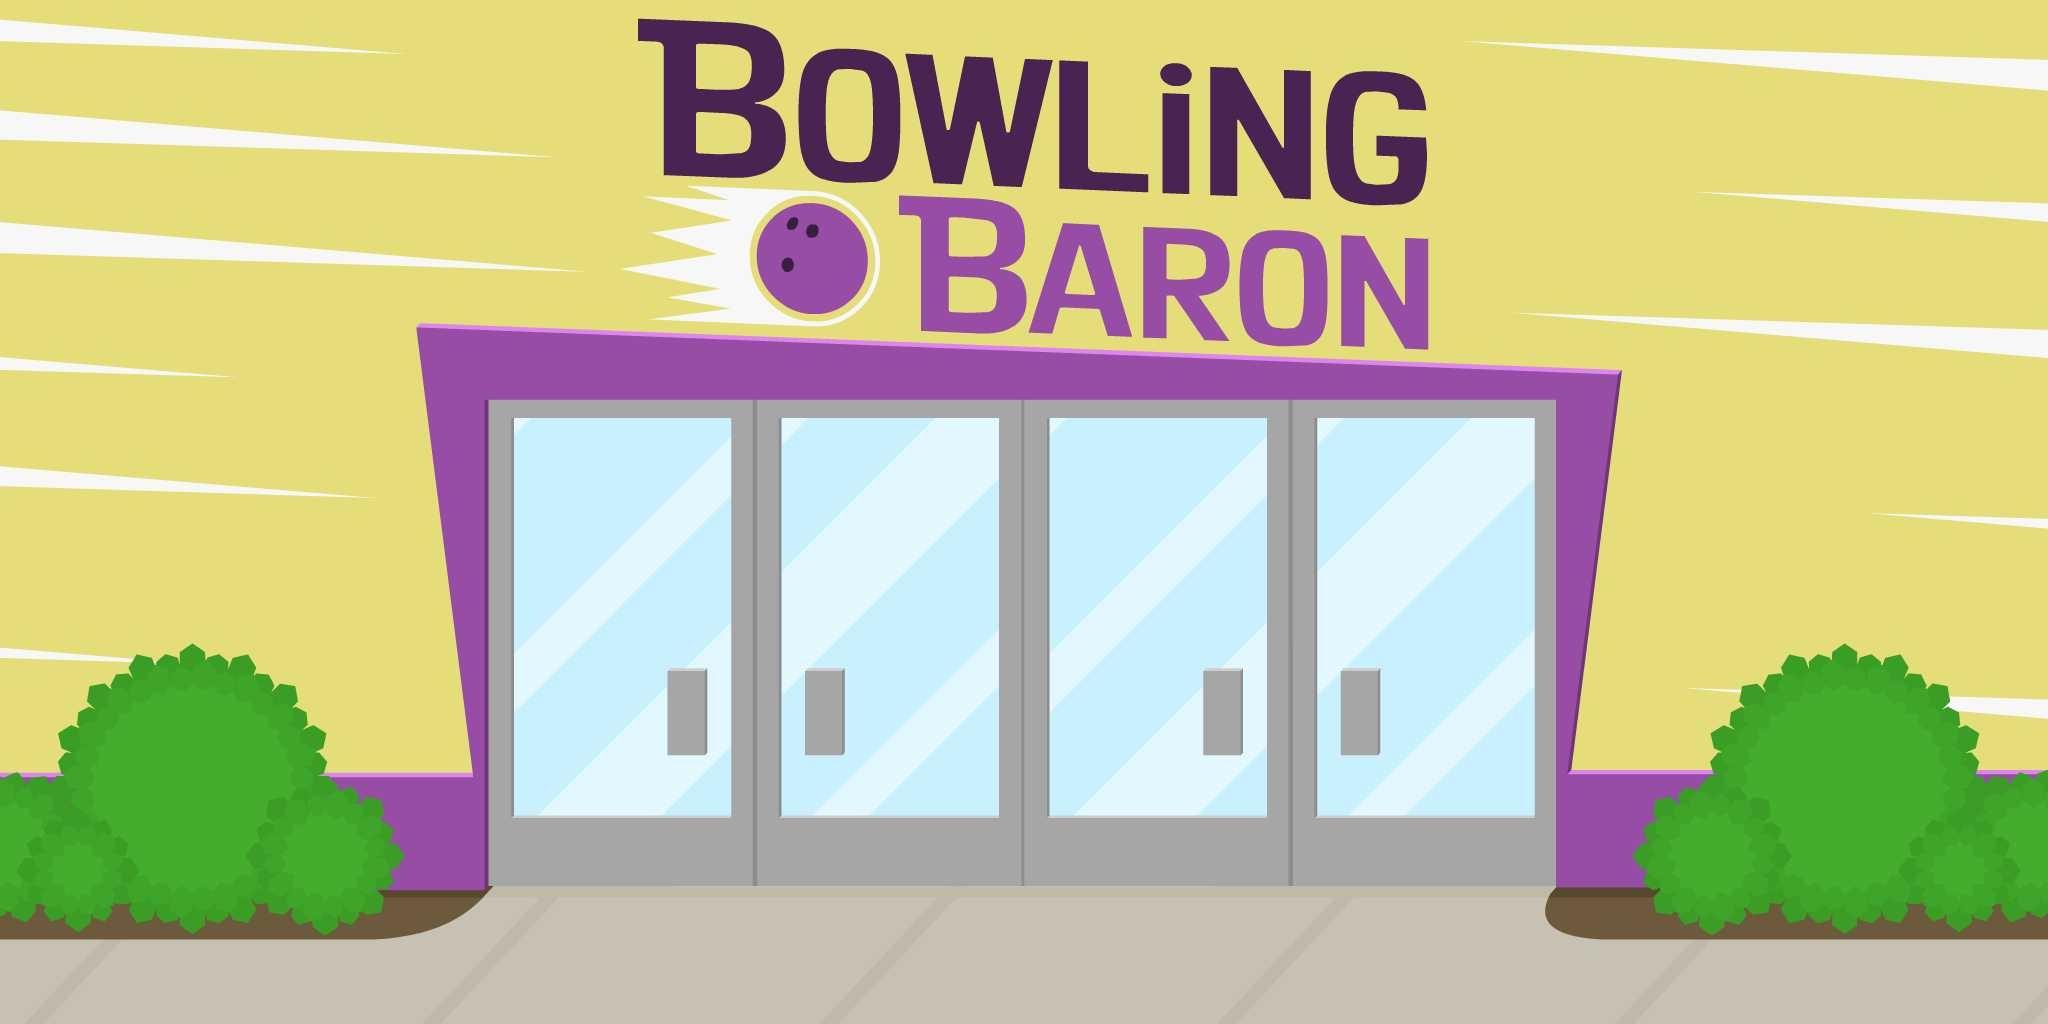 Bowling Baron